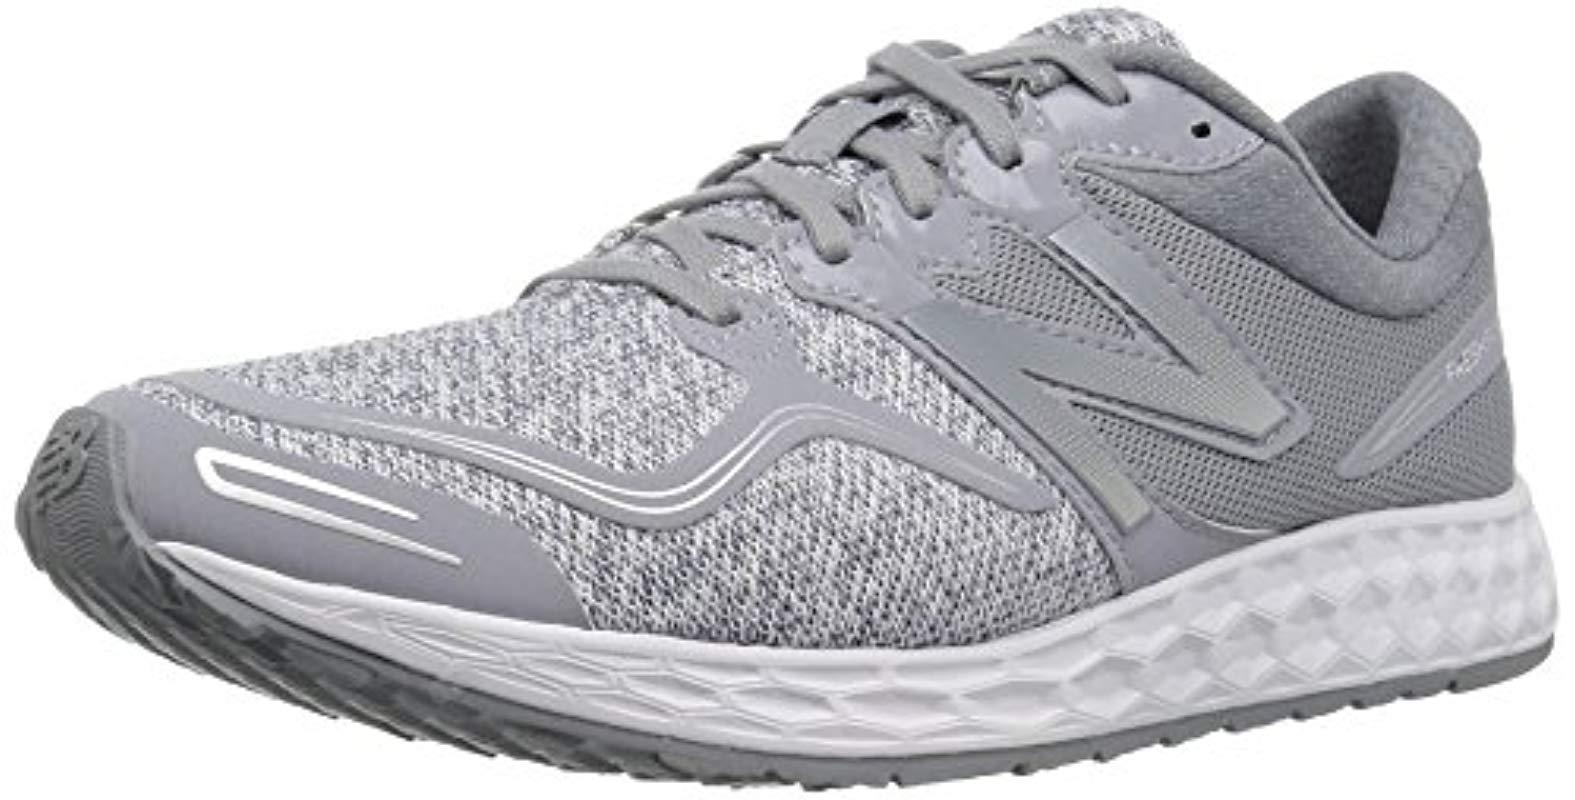 New Balance Fresh Foam Veniz V1 Running Shoe in Gray - Lyst